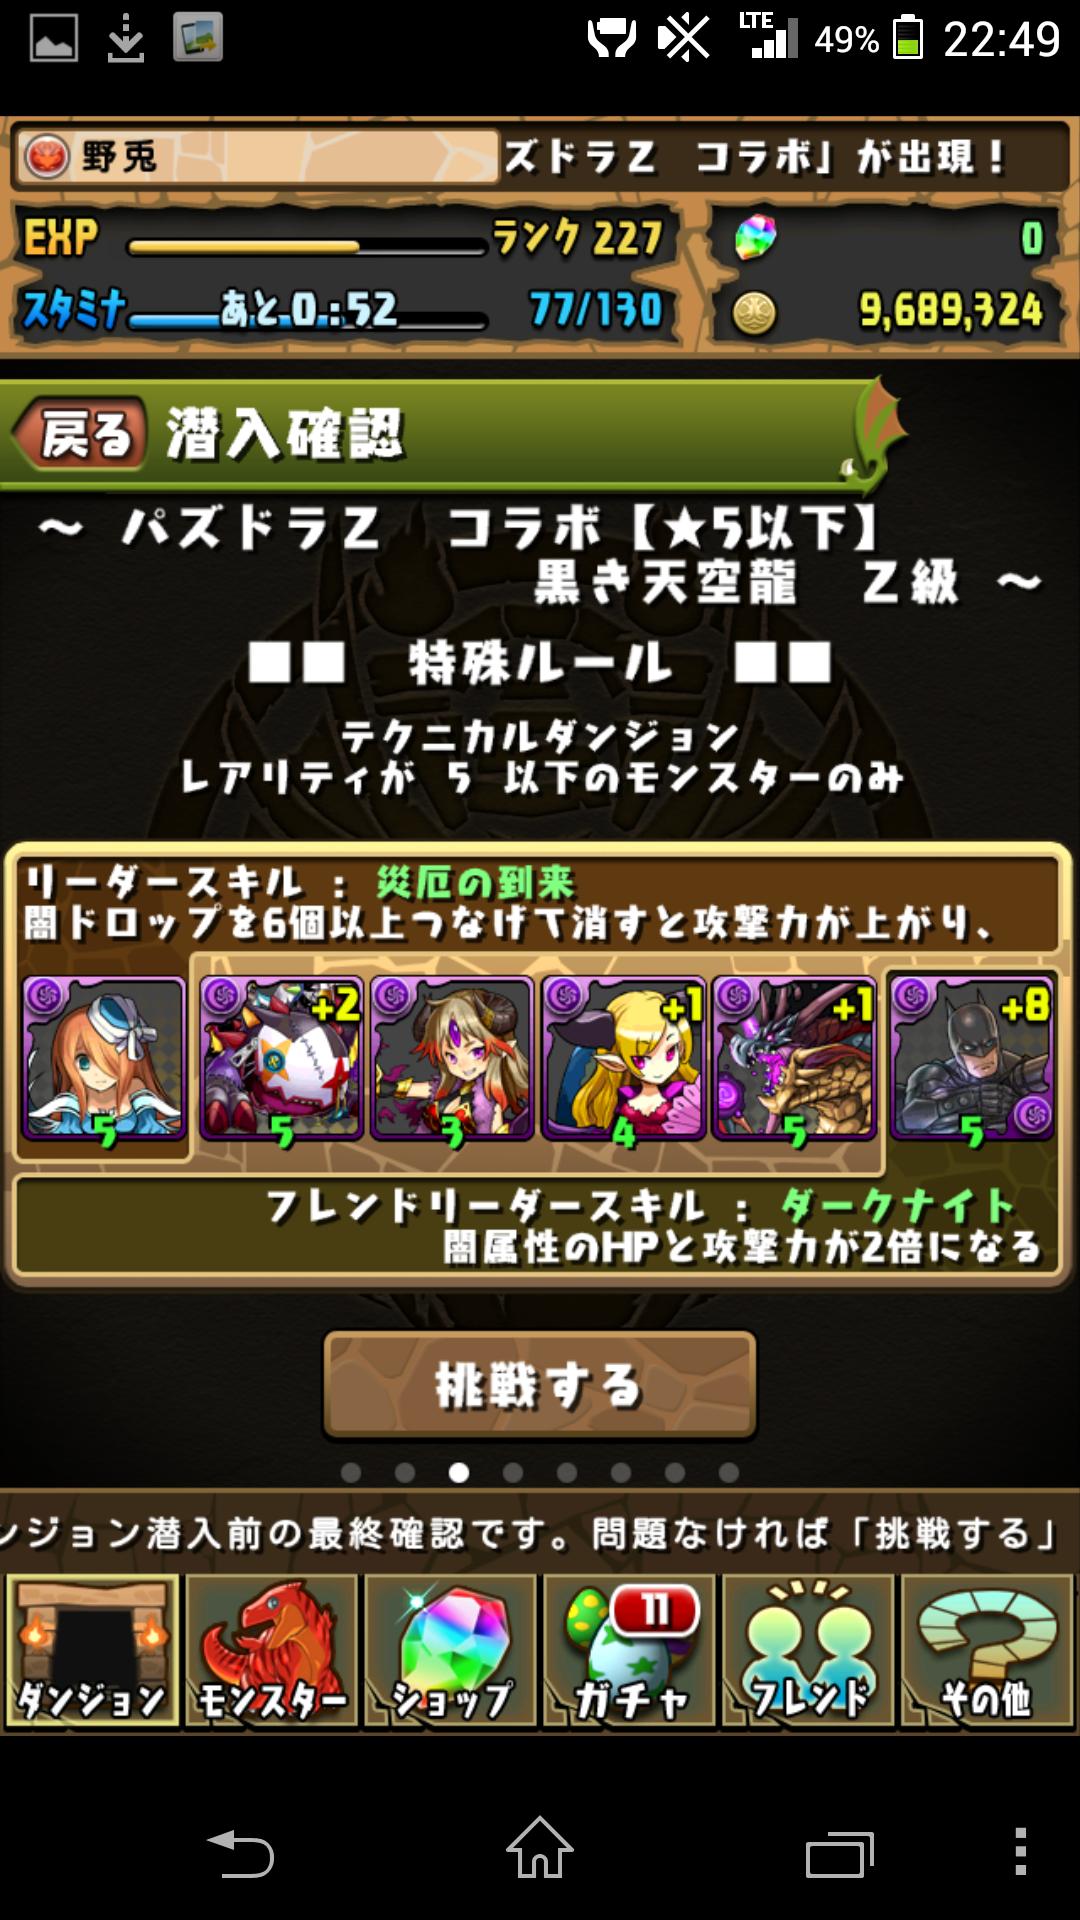 Screenshot_2014-04-15-22-49-41.png